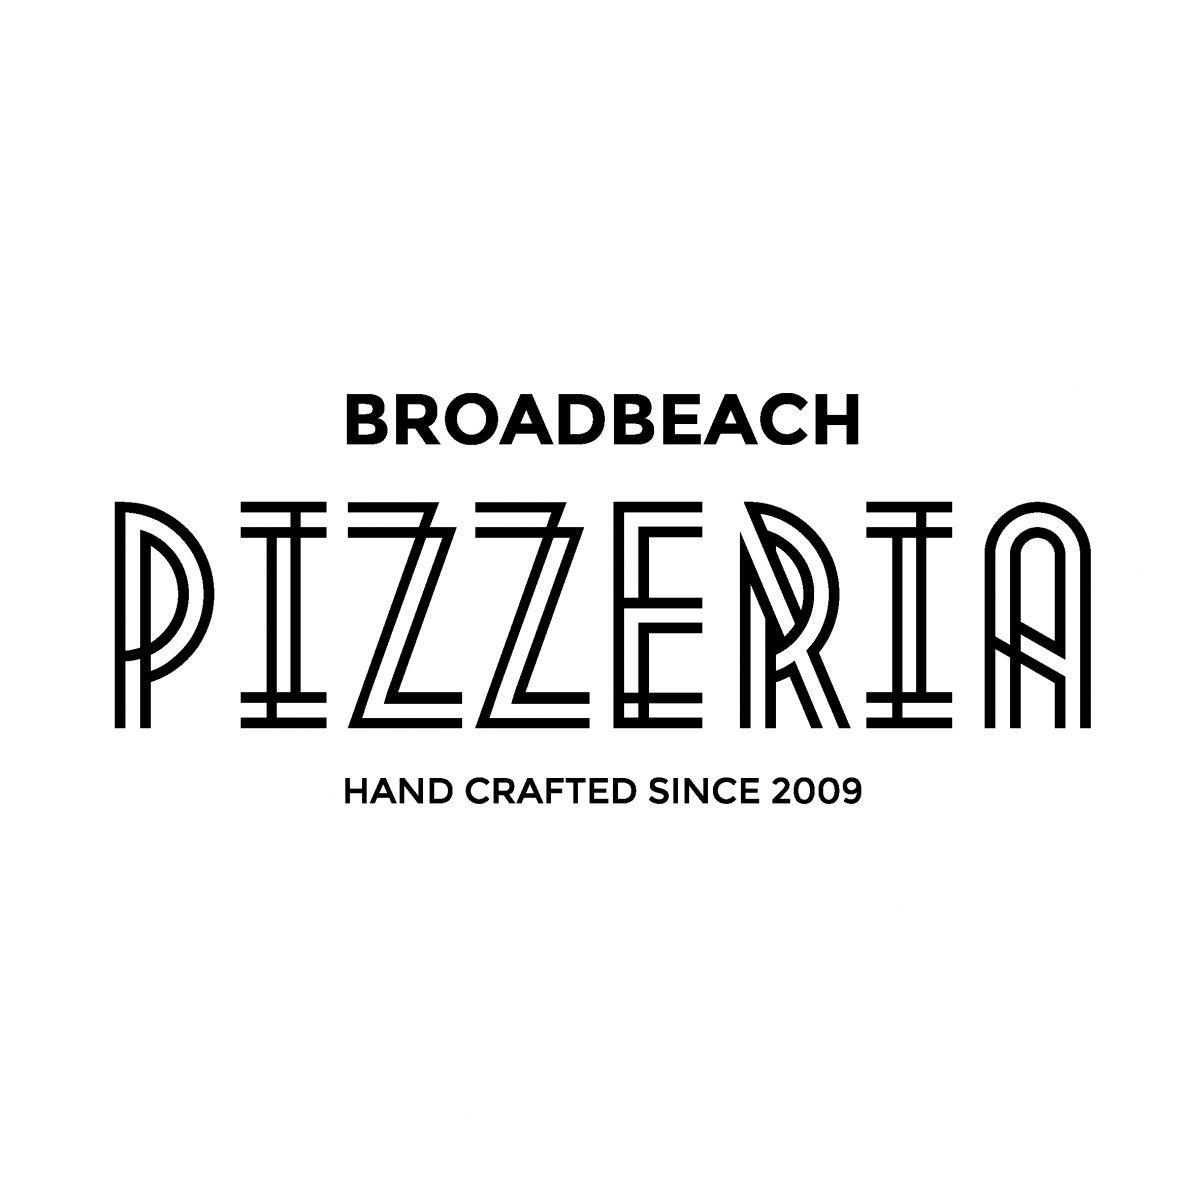 Pizzeria Broadbeach BLK